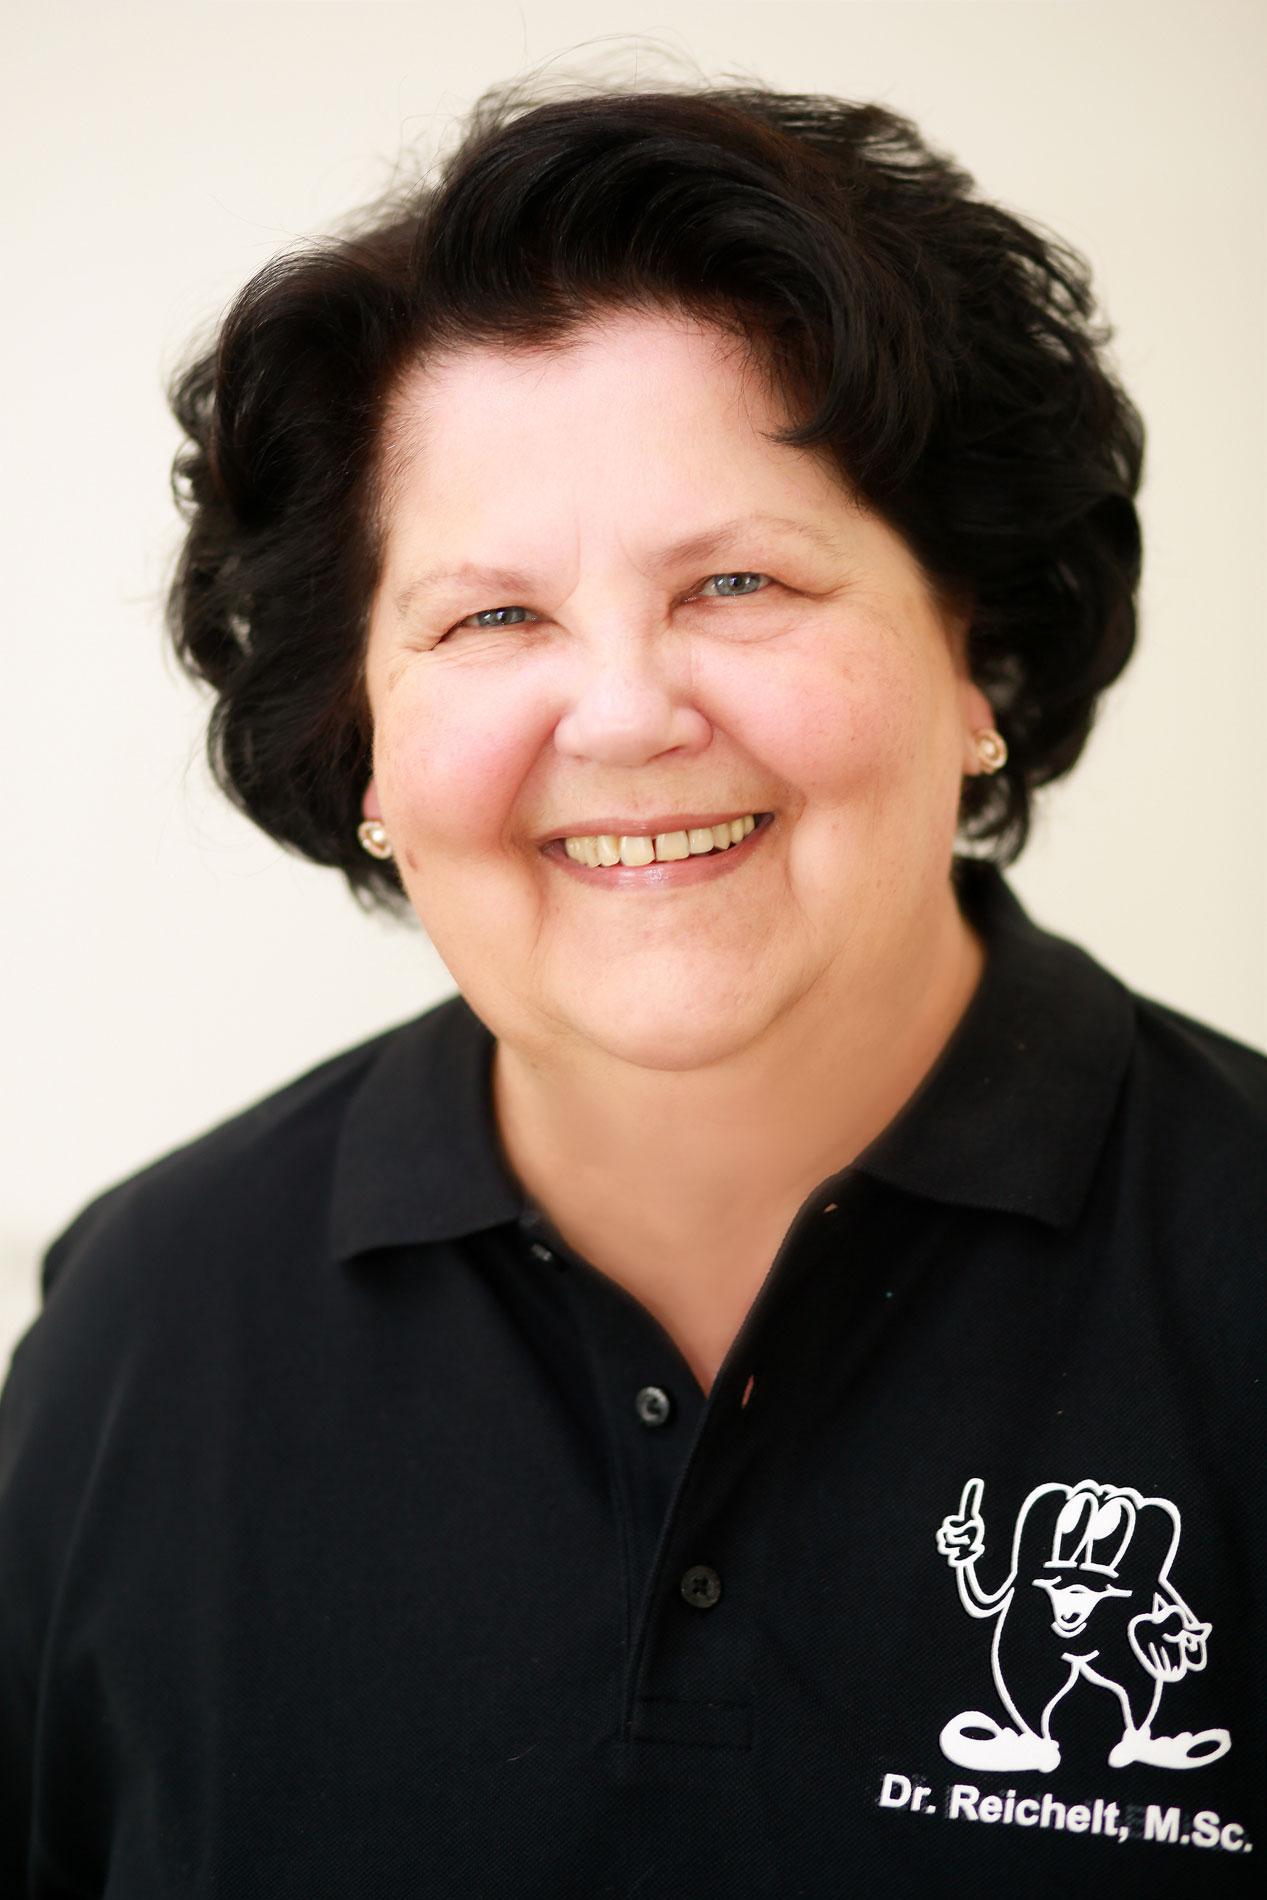 Dr. Gisela Reichelt M. Sc.